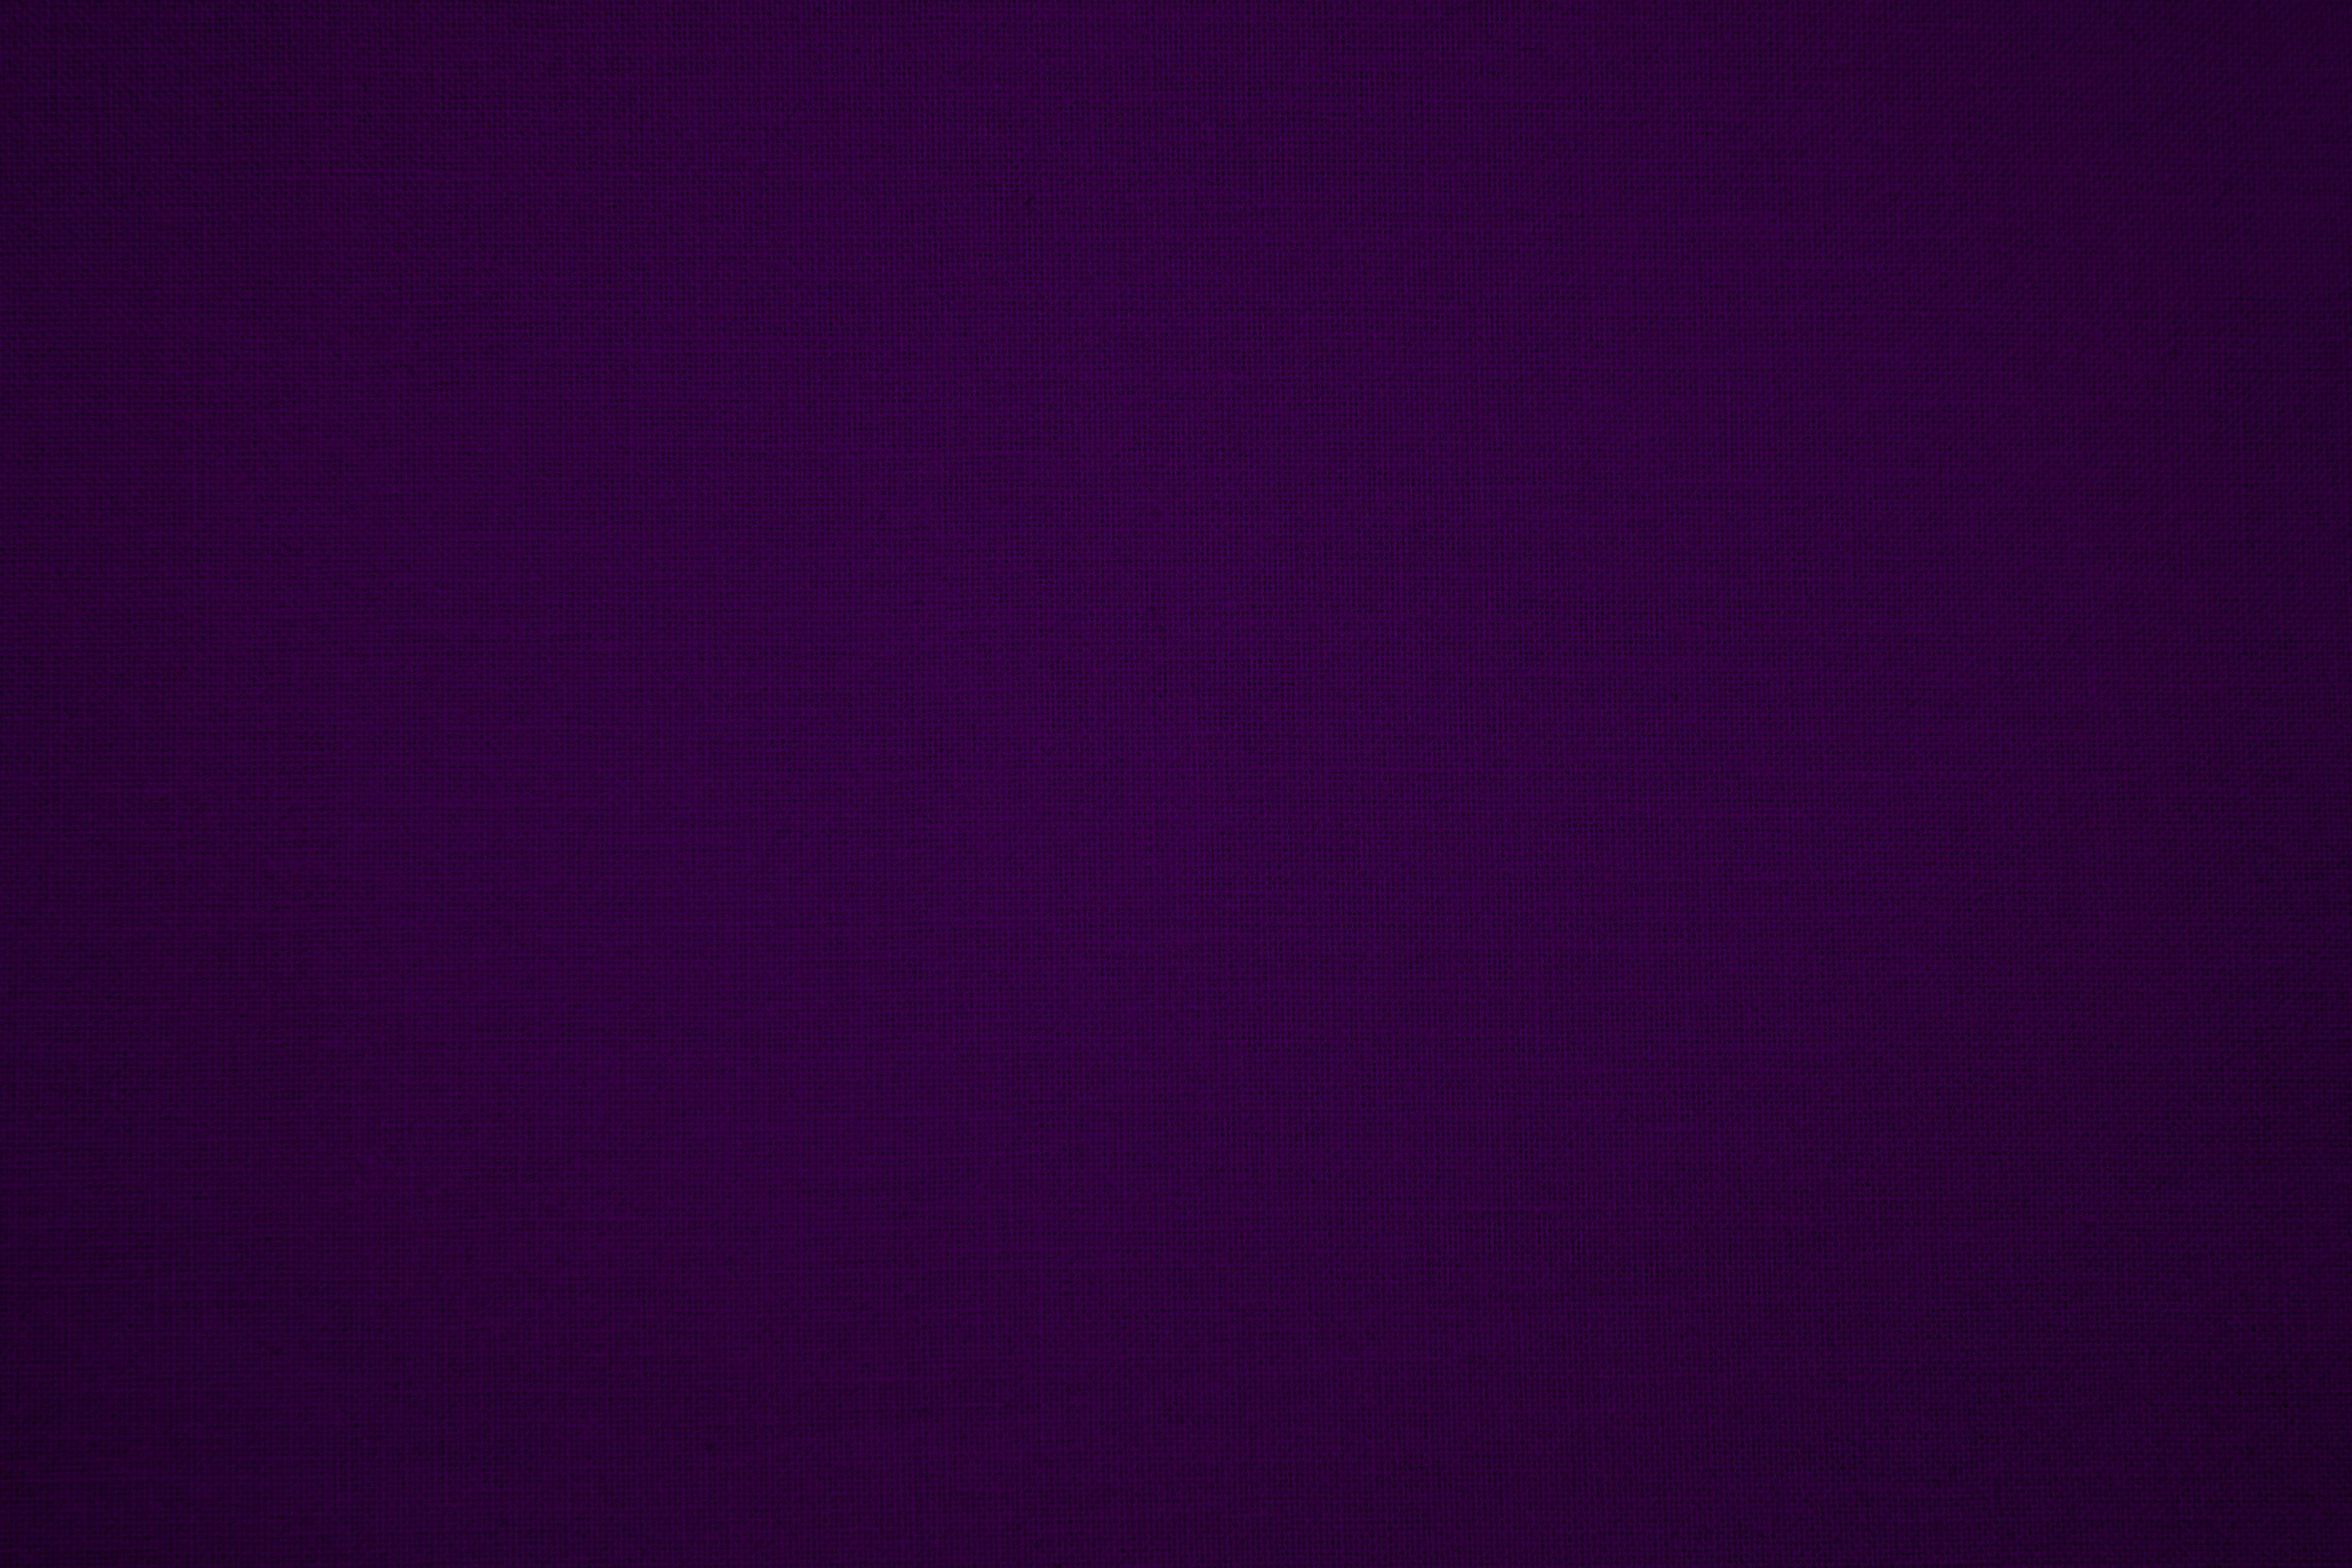 Pin by Liel Thistle on Purple World  Blue paint colors